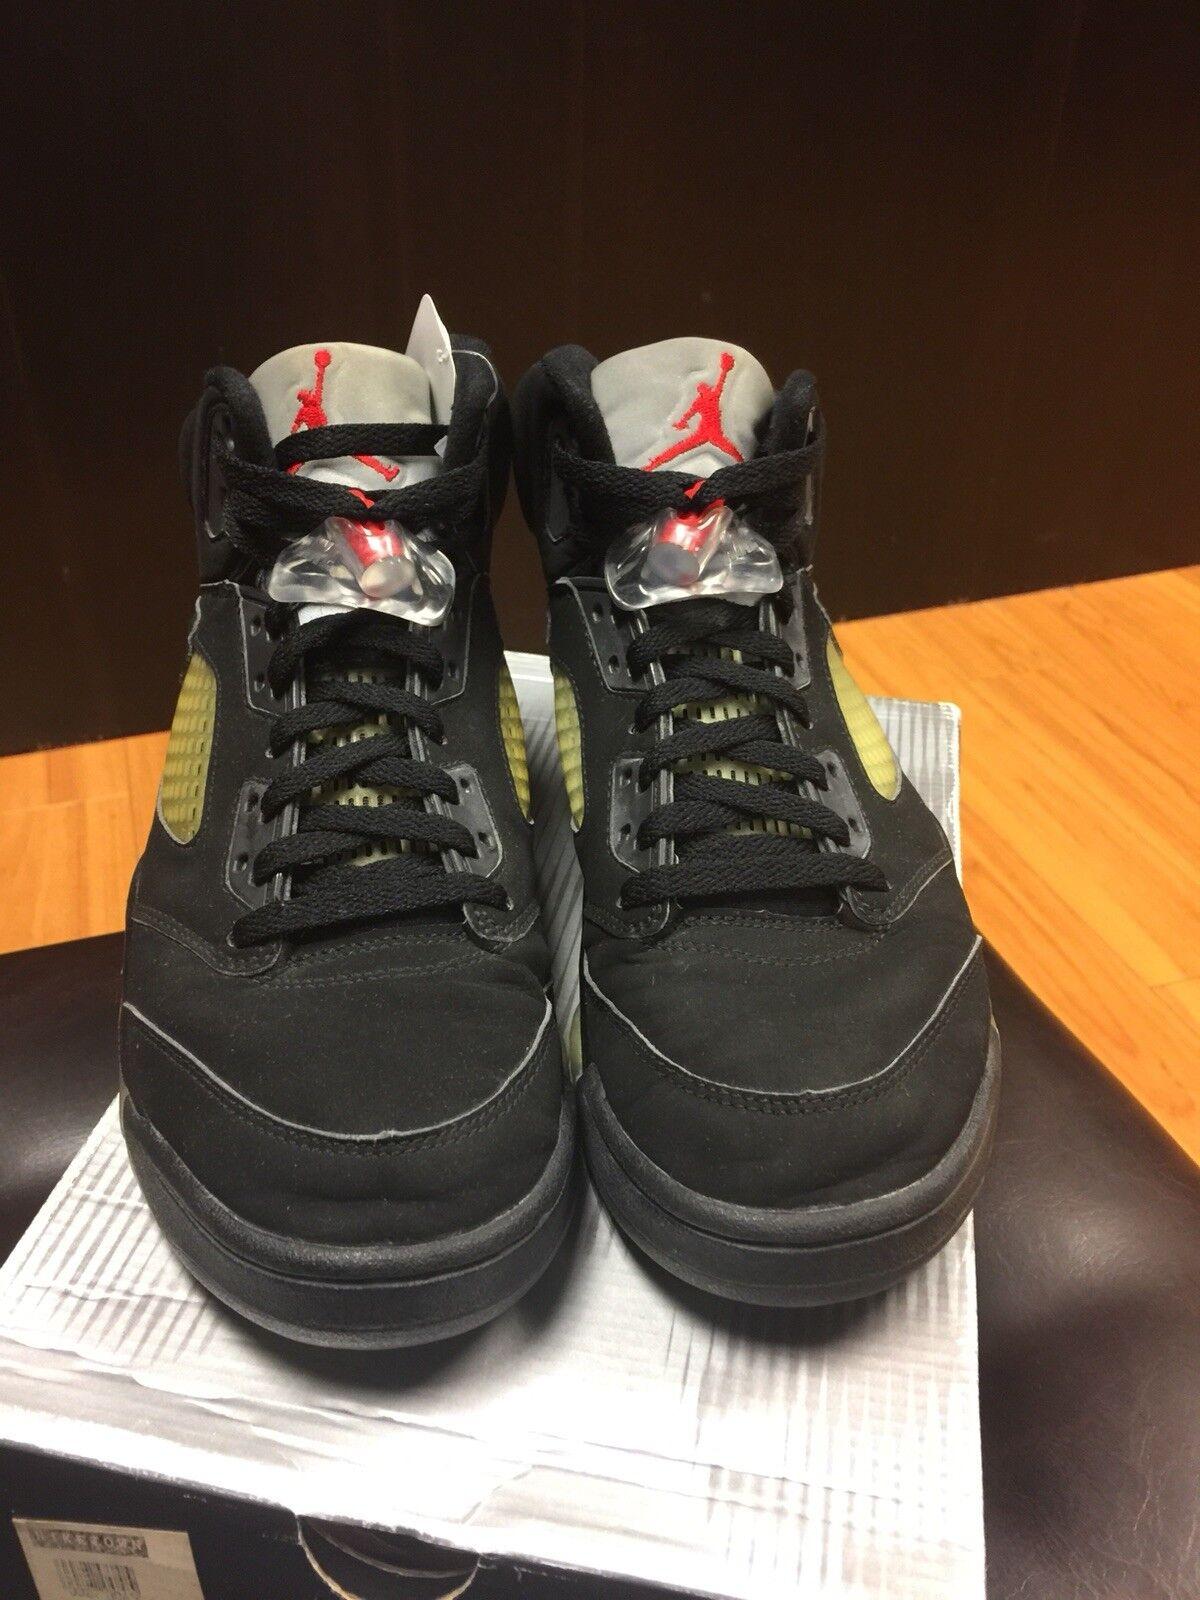 2000 Nike Air Jordan V 5 Black Metallic Silver 136027-001 Sz 8.5 DS Pre-owned